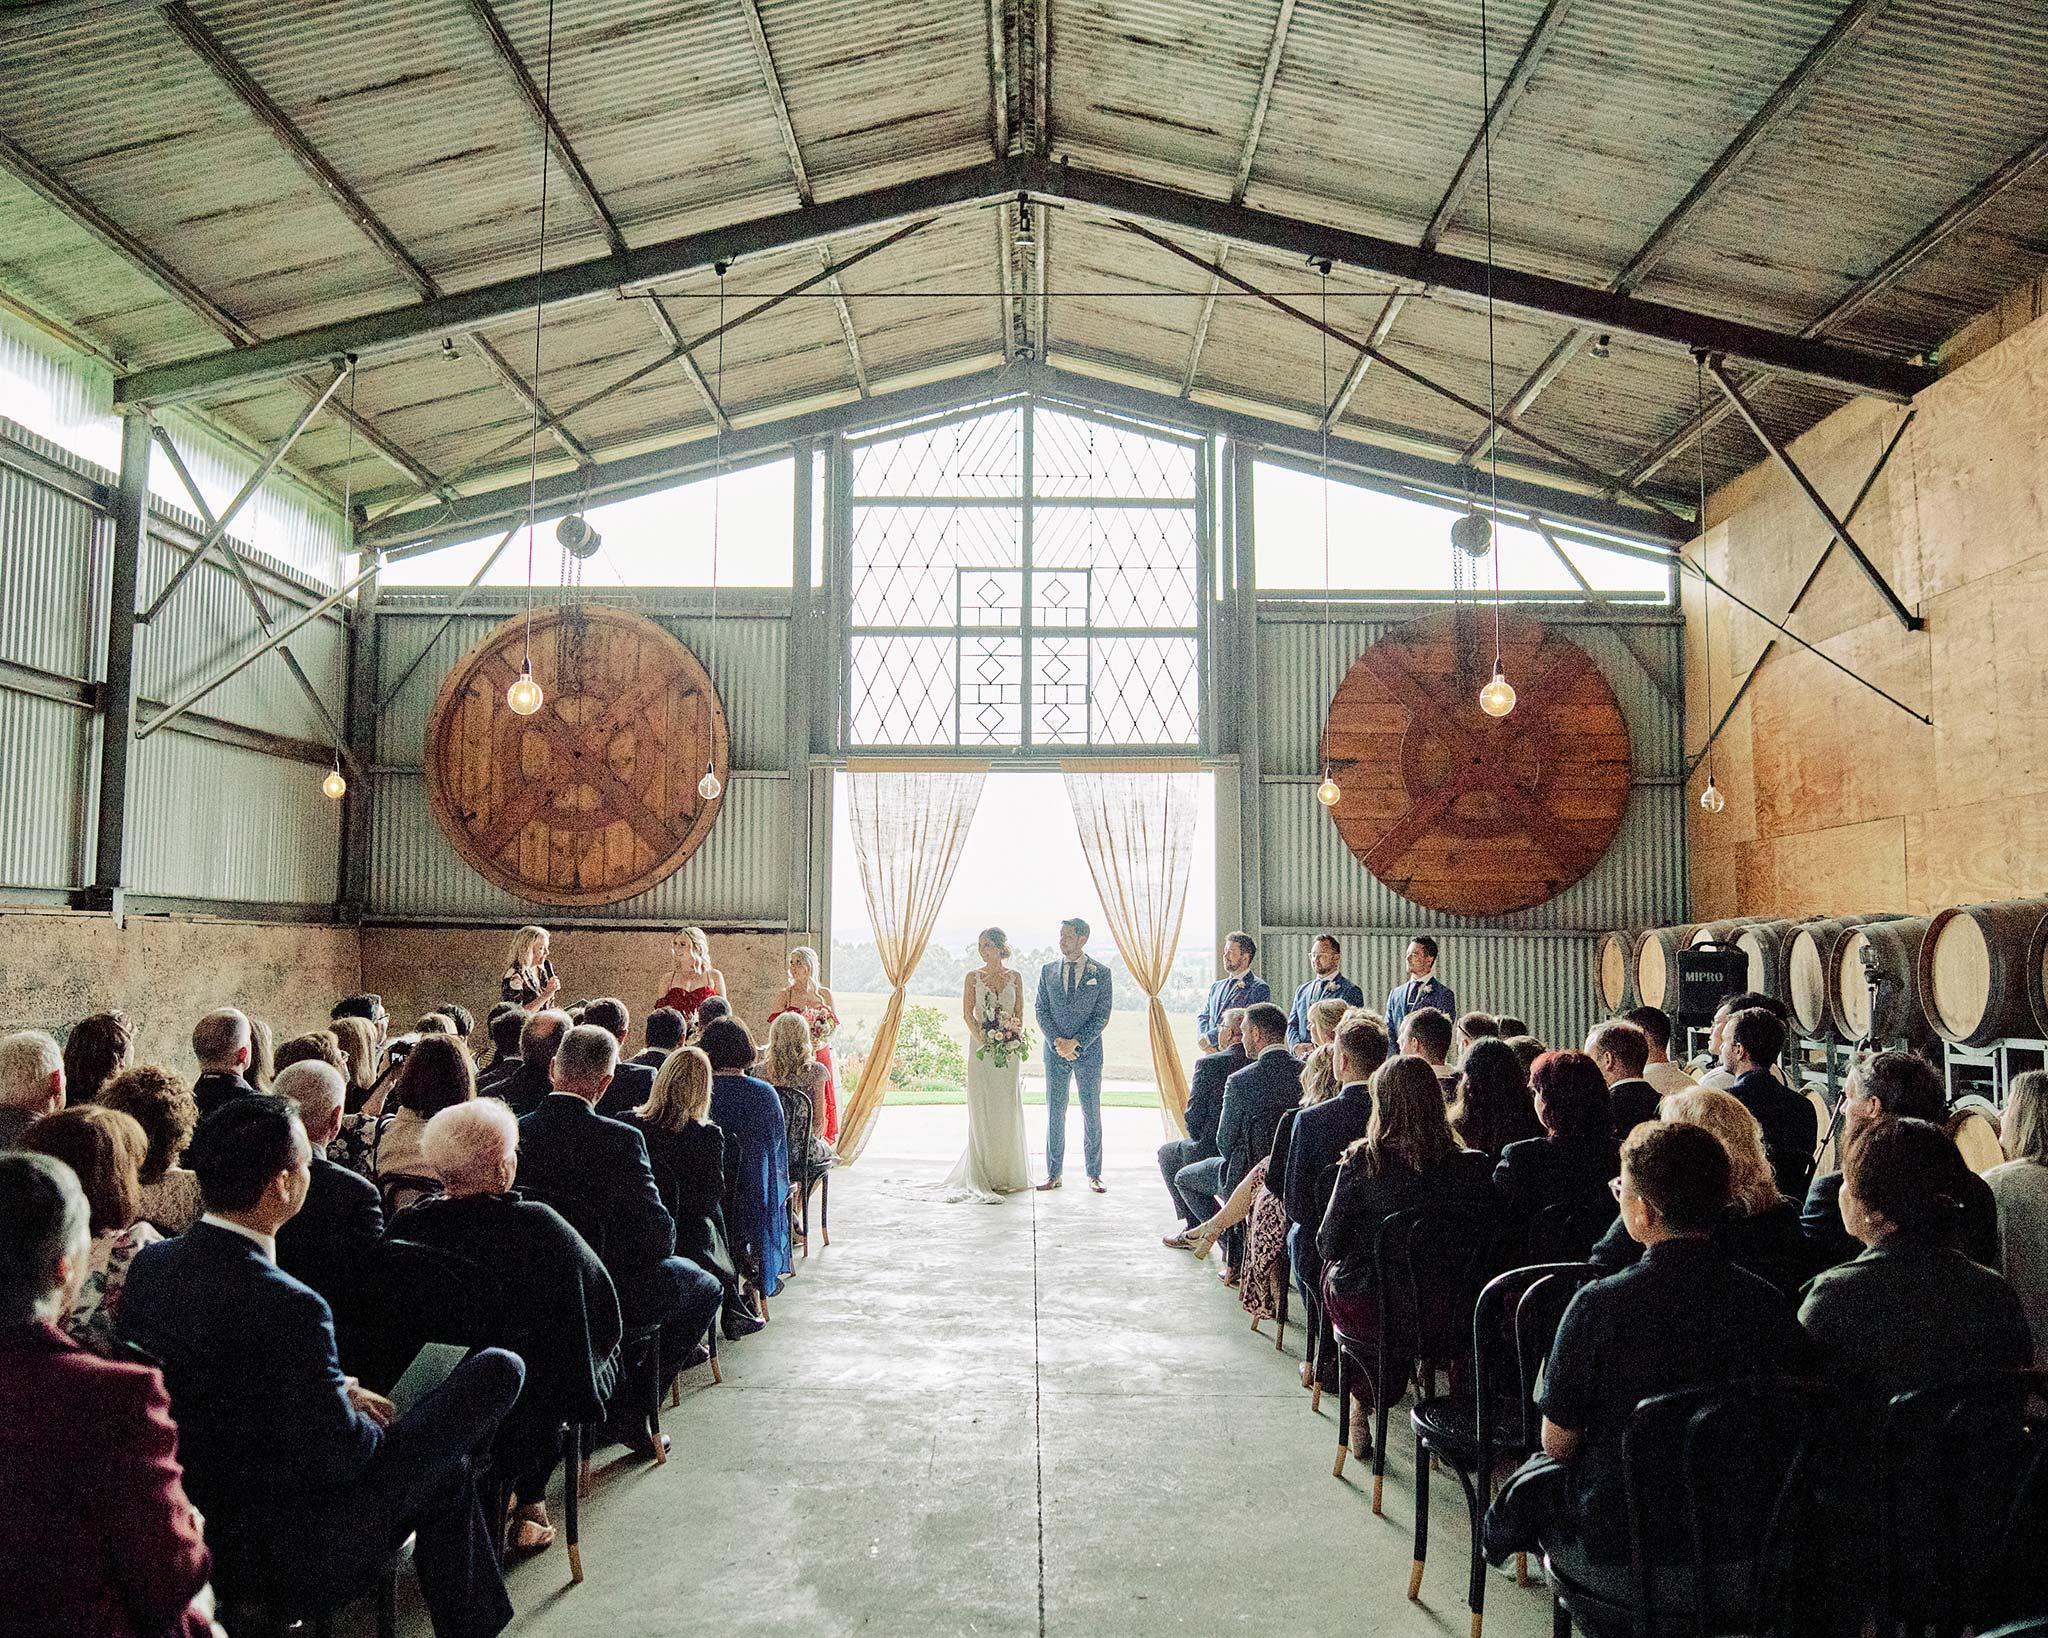 Zonzo estate wedding full ceremony barn view